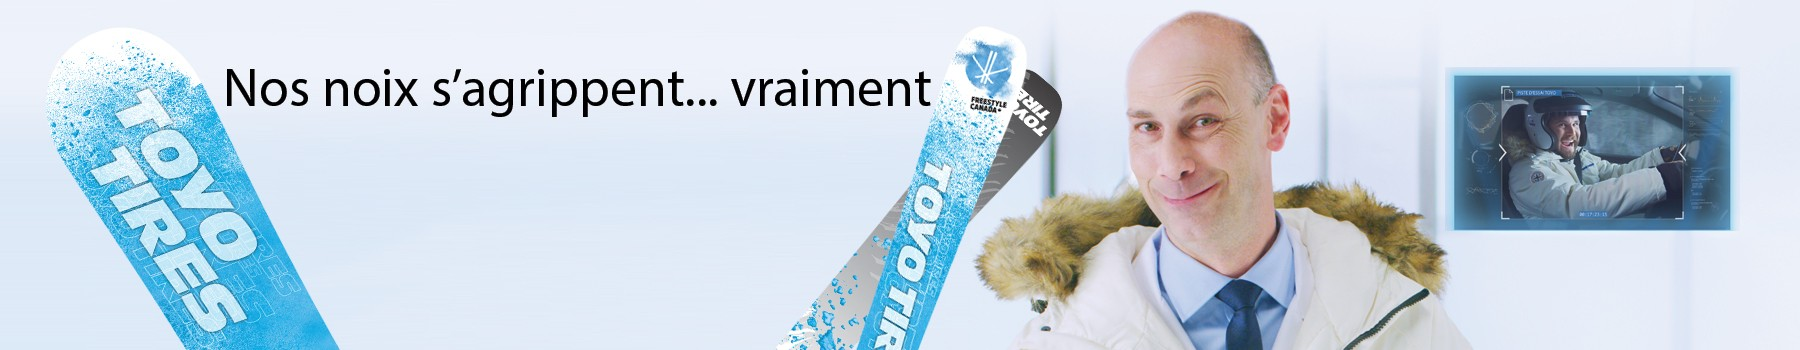 fall2018_ski_contest_banner_fr_2.